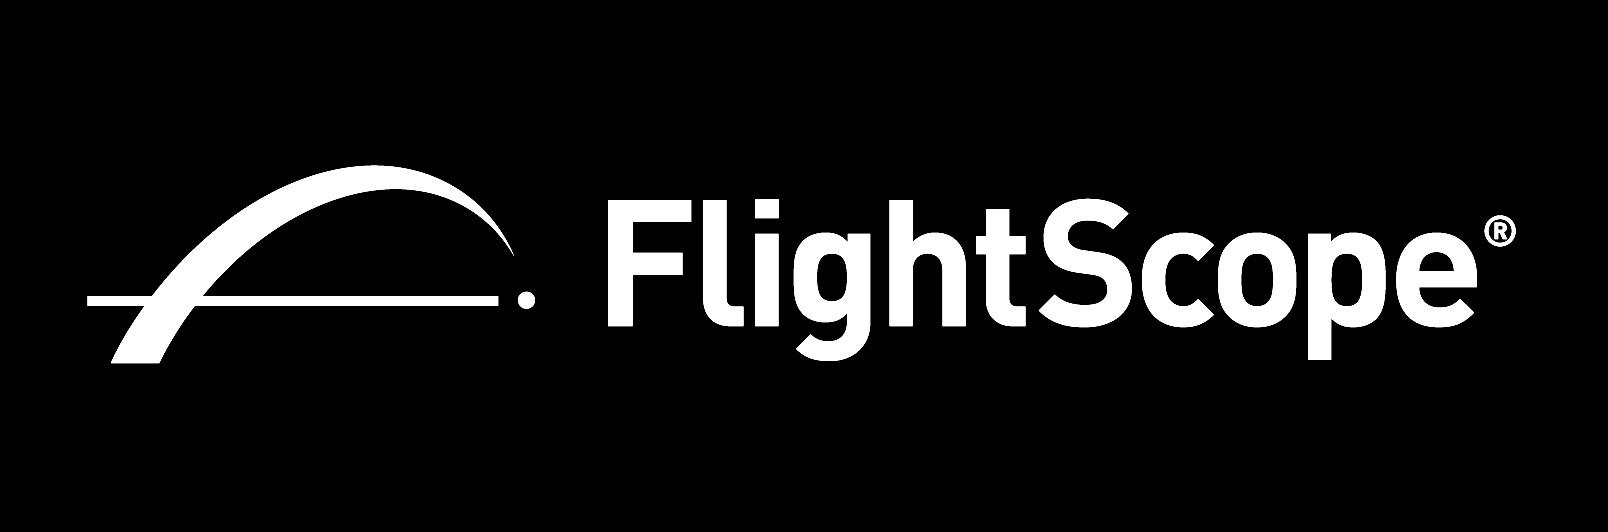 flightscopeblack.jpg